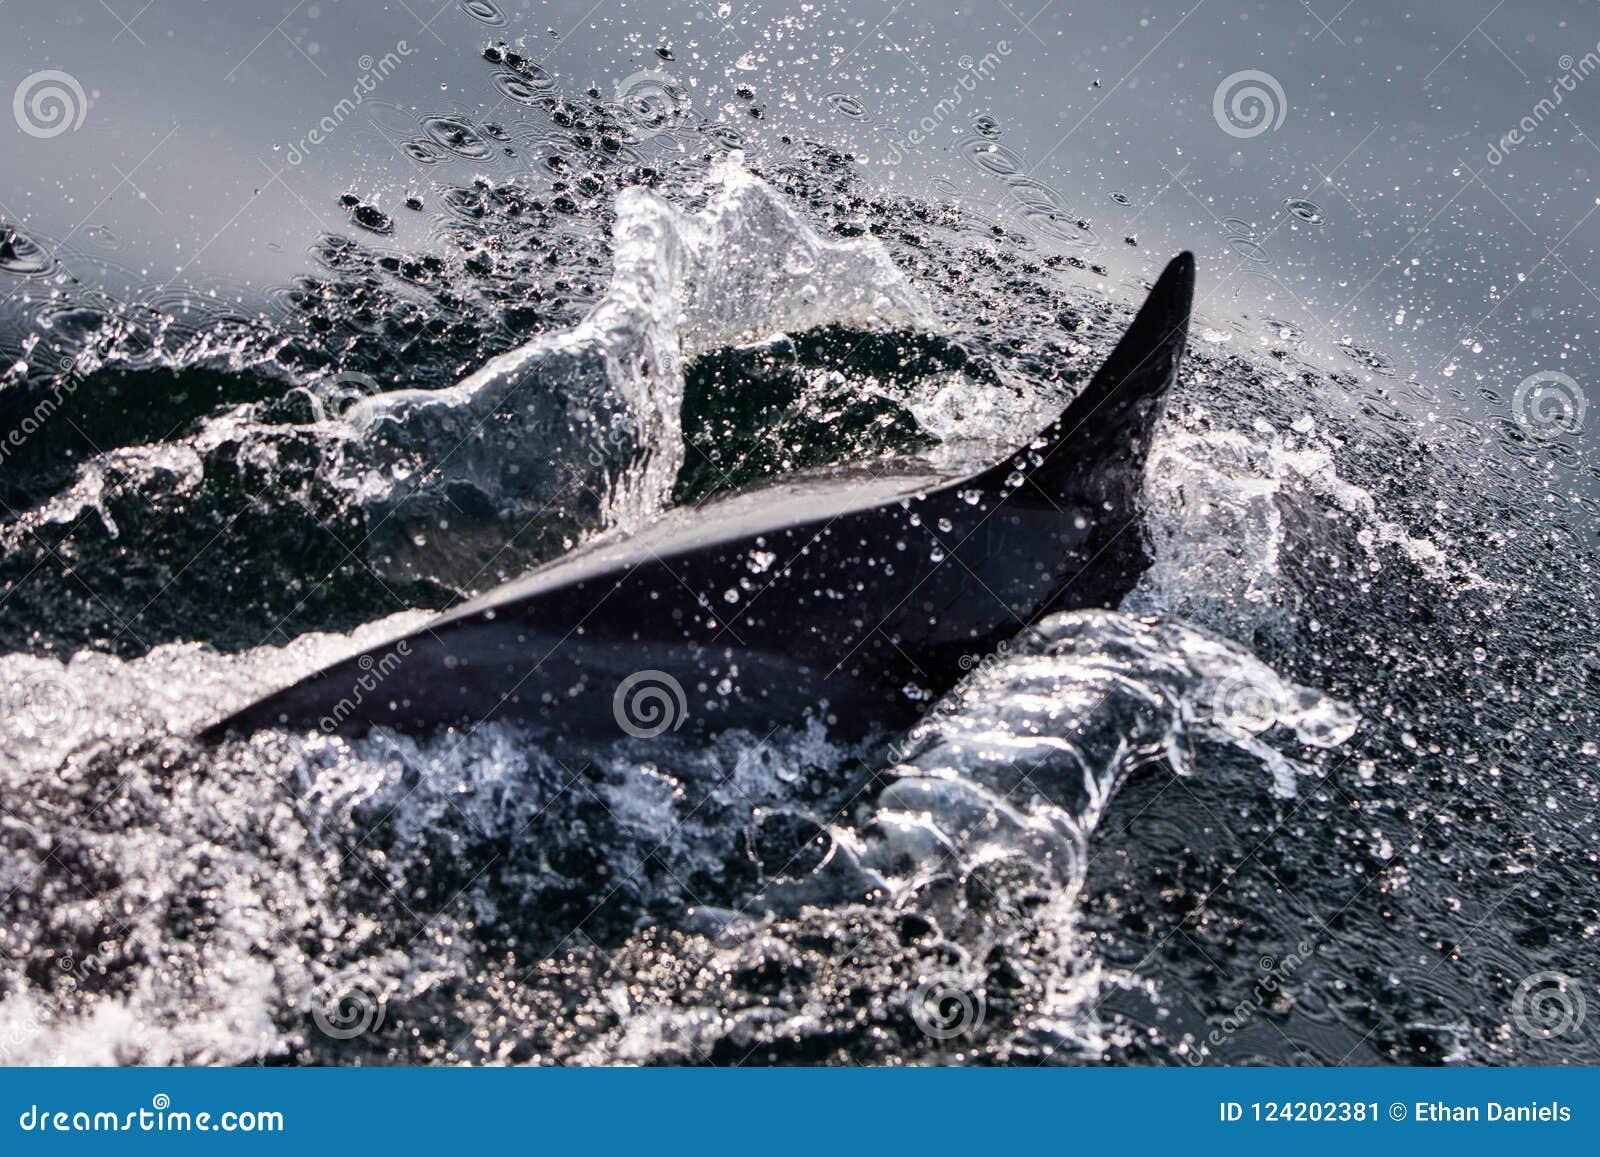 Common Dolphin Swimming In Atlantic Ocean Stock Image